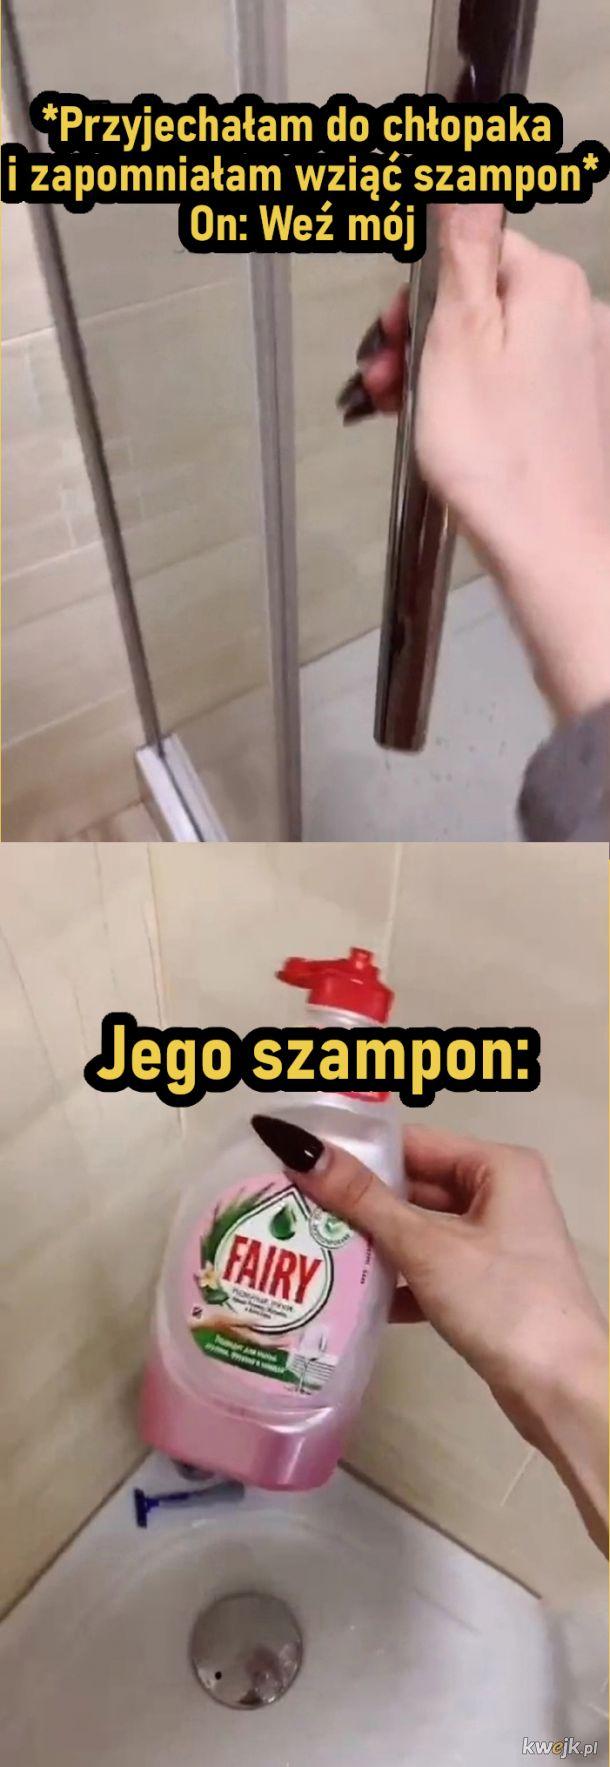 Męski szampon